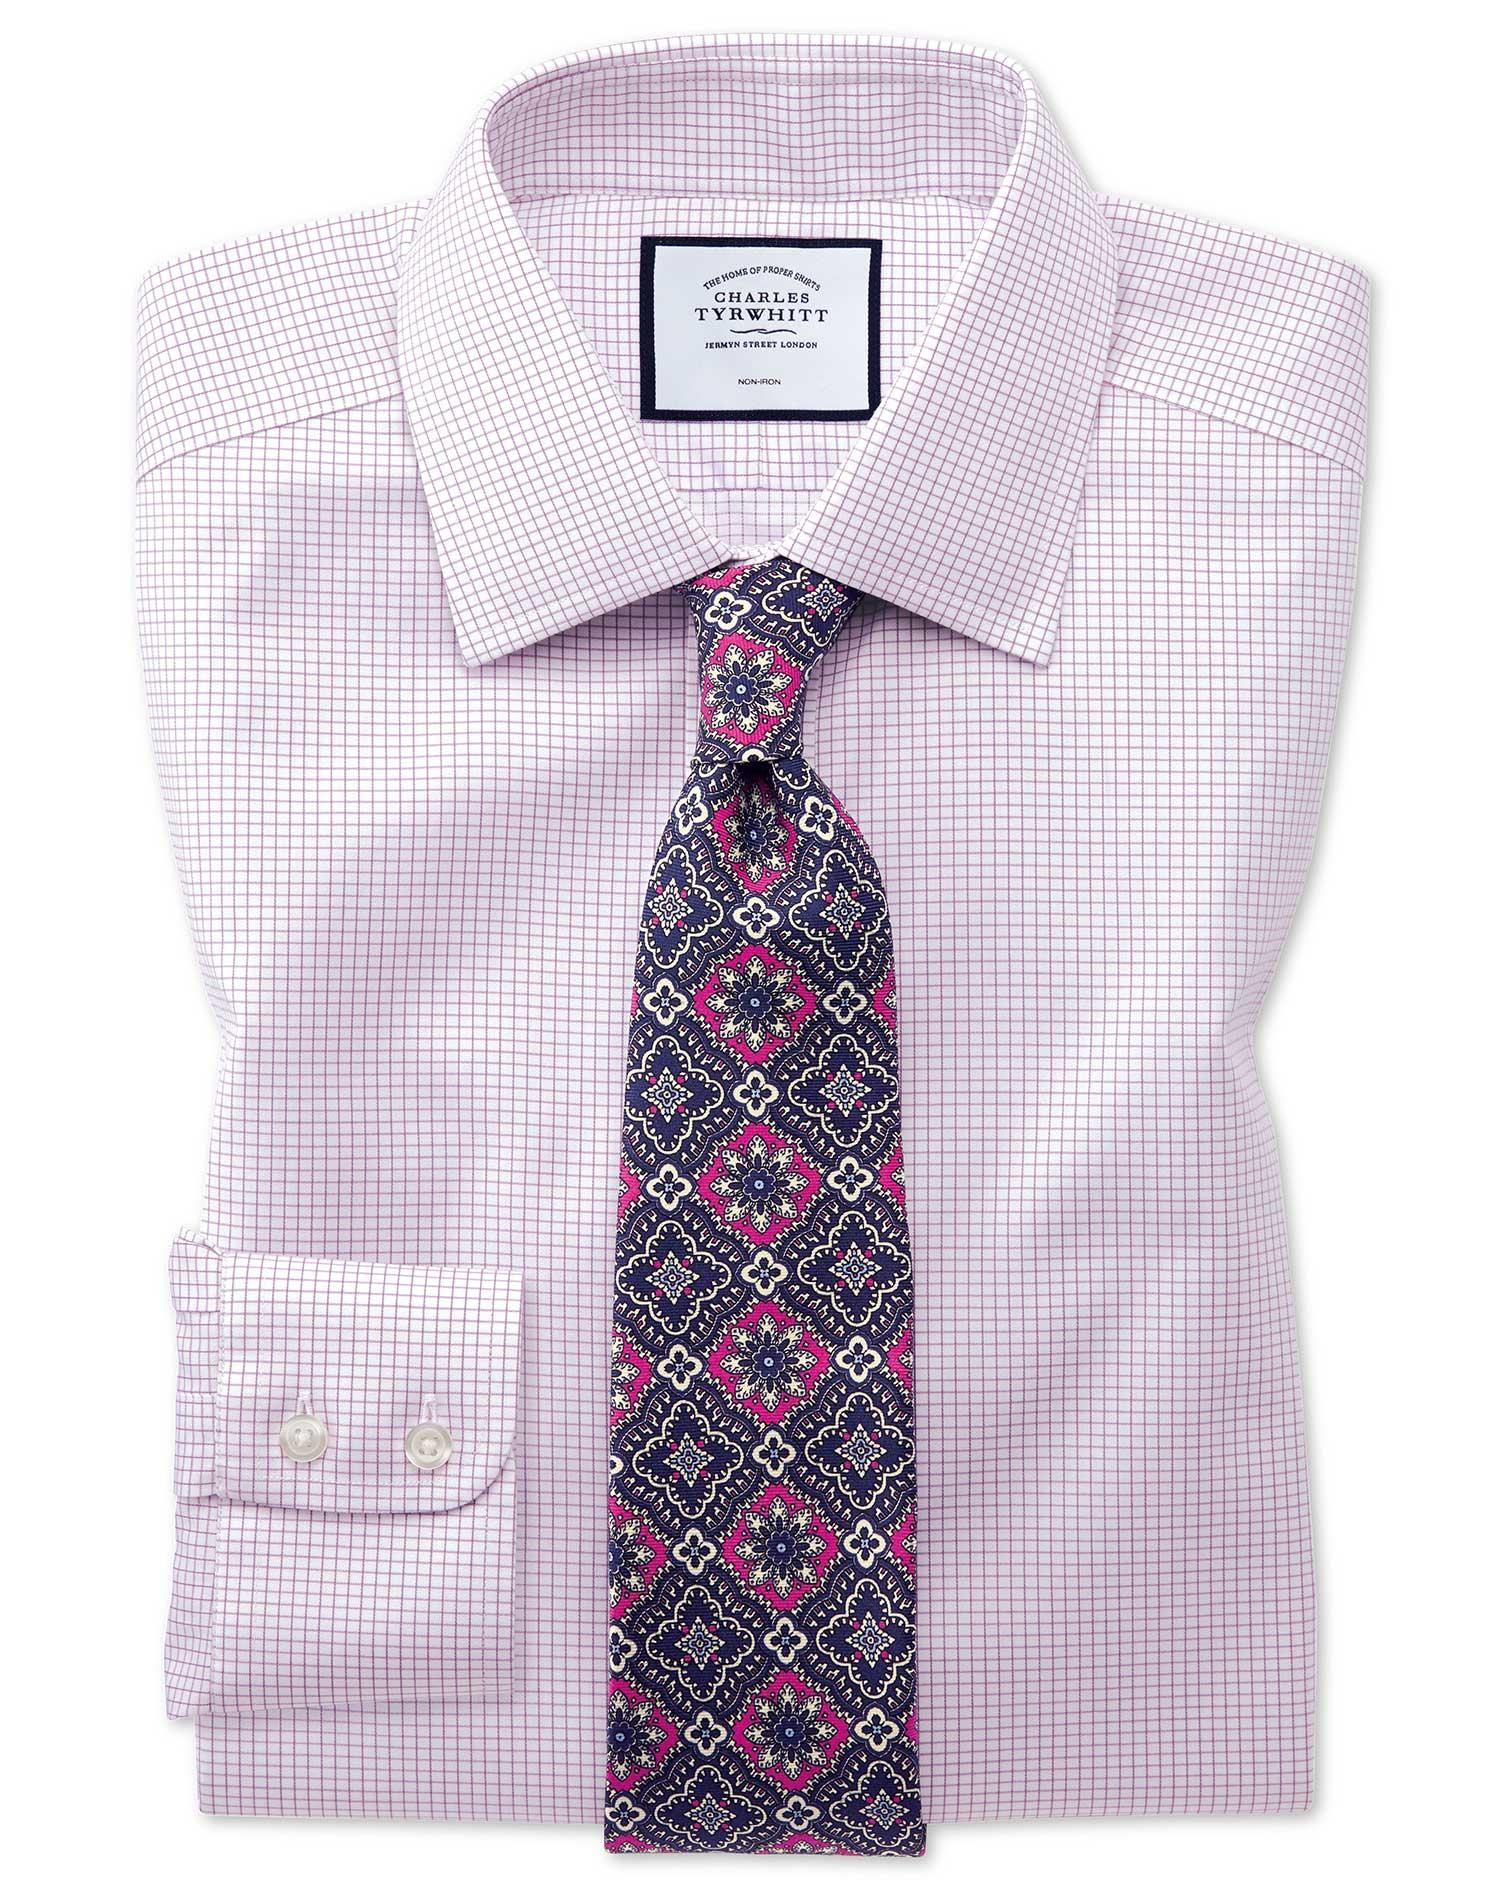 Classic Fit Non-Iron Twill Mini Grid Check Purple Cotton Formal Shirt Single Cuff Size 17/36 by Char